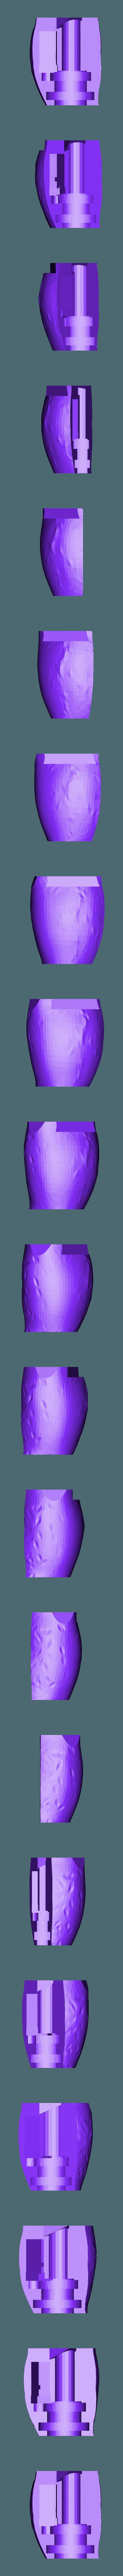 gadgets bicep pt3 left 2print .stl Download free STL file GADGET the robotic Gremlin • 3D printing object, atarka3